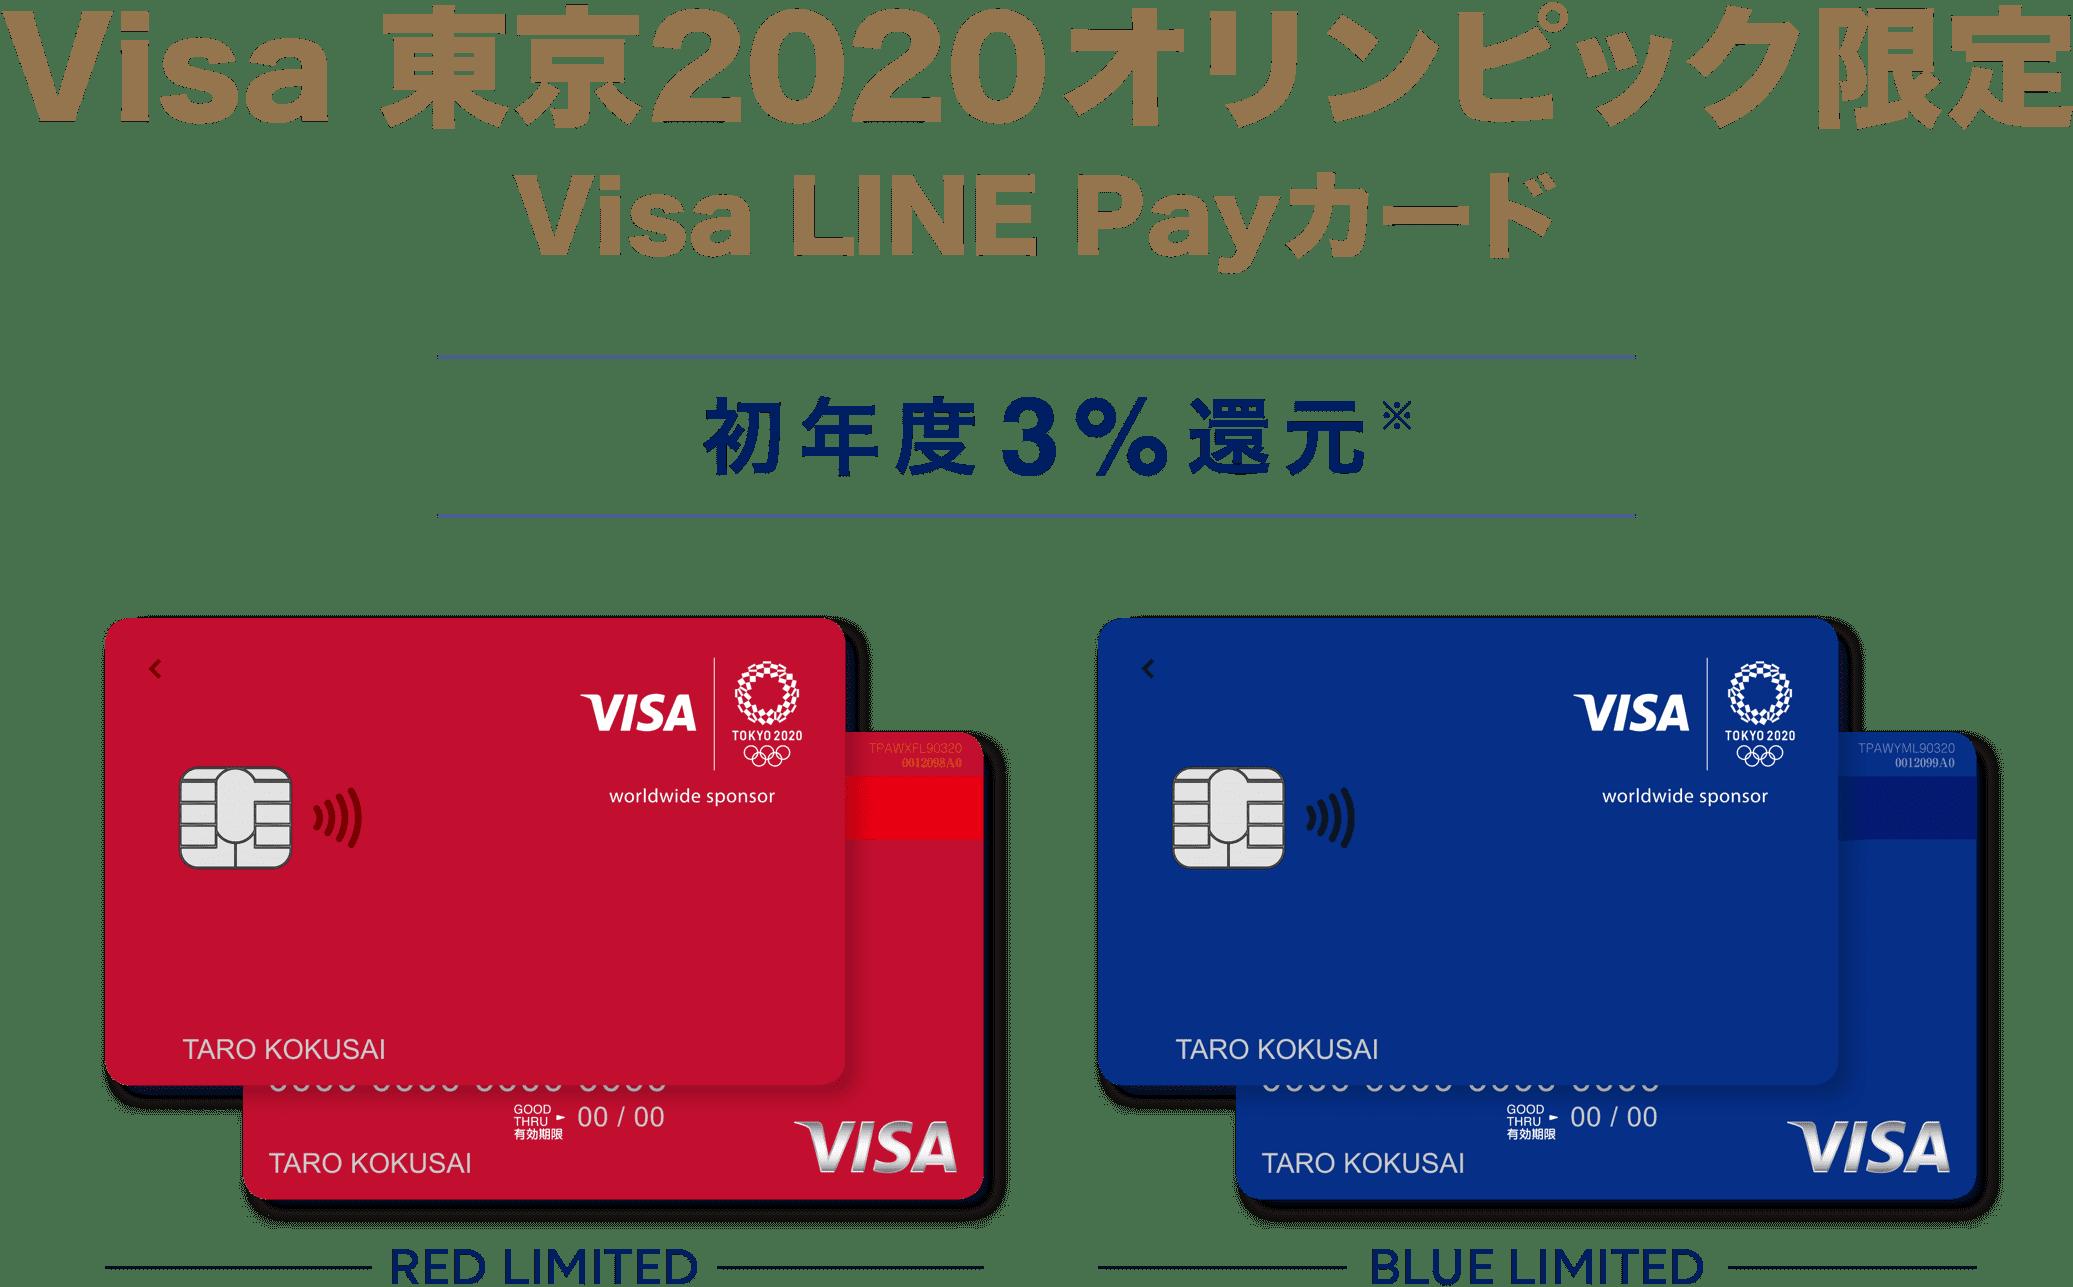 Visa 東京2020オリンピック限定 Visa LINE Payカード 初年度3%還元!※